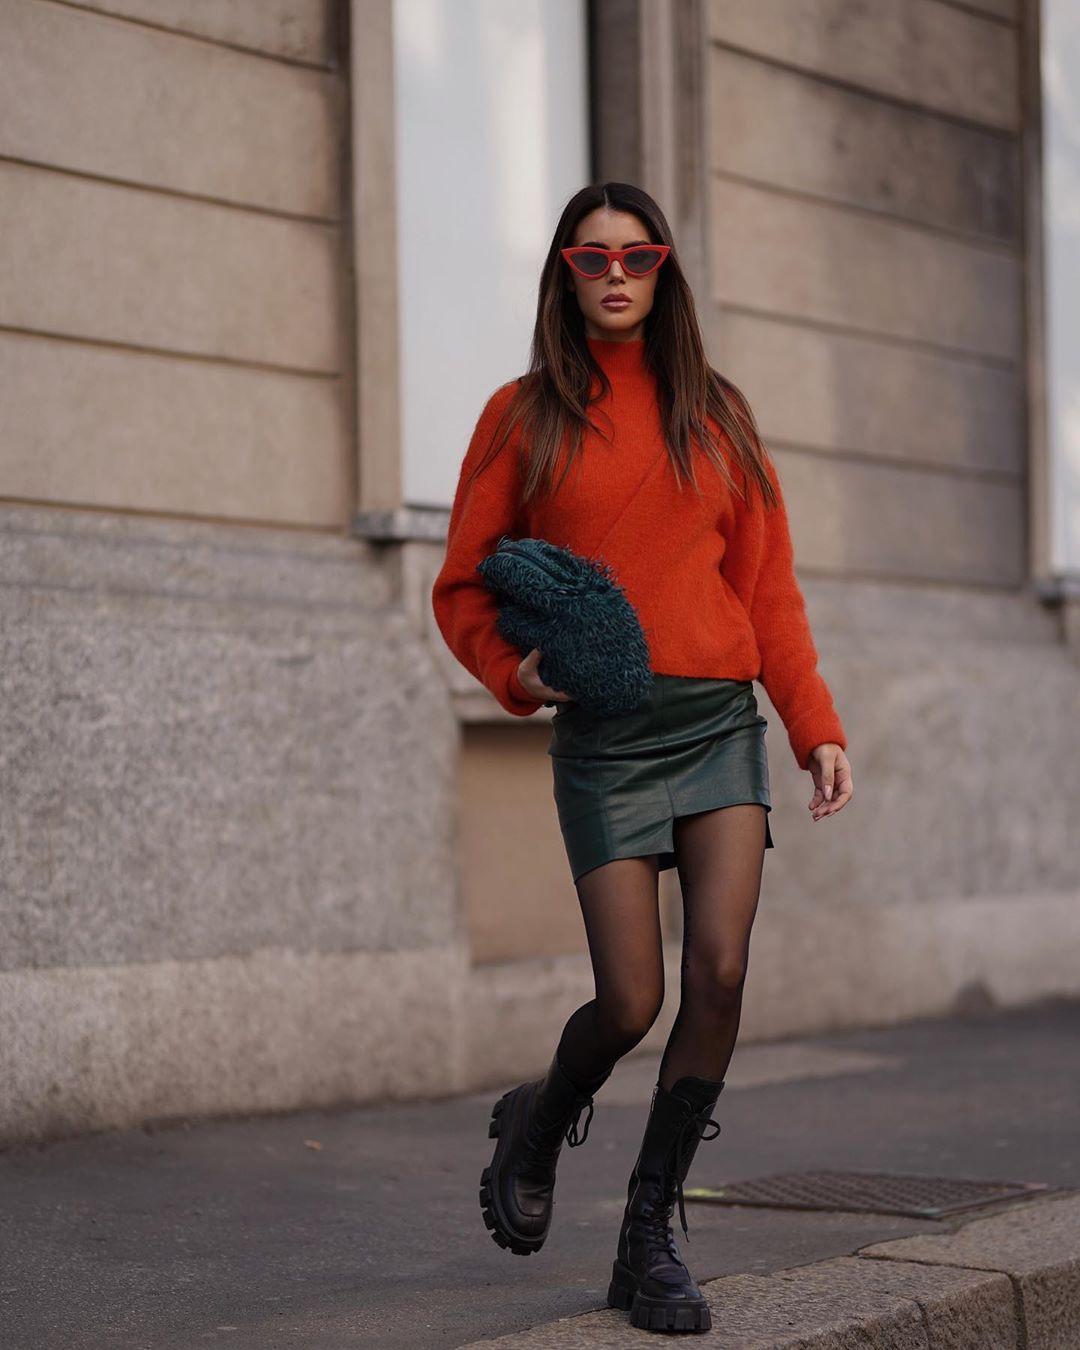 Silvia Caruso girls instagram photos, hot legs girls, legs photo